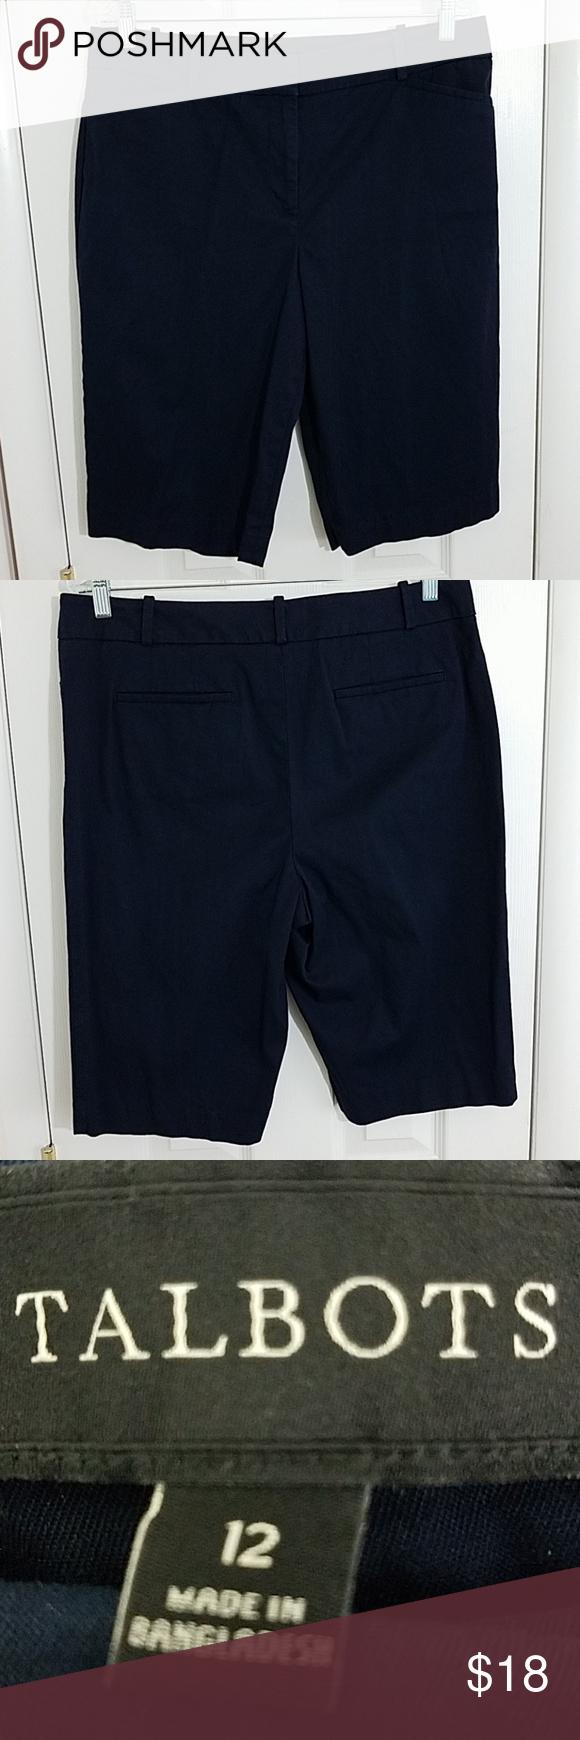 Talbots Cotton Shorts